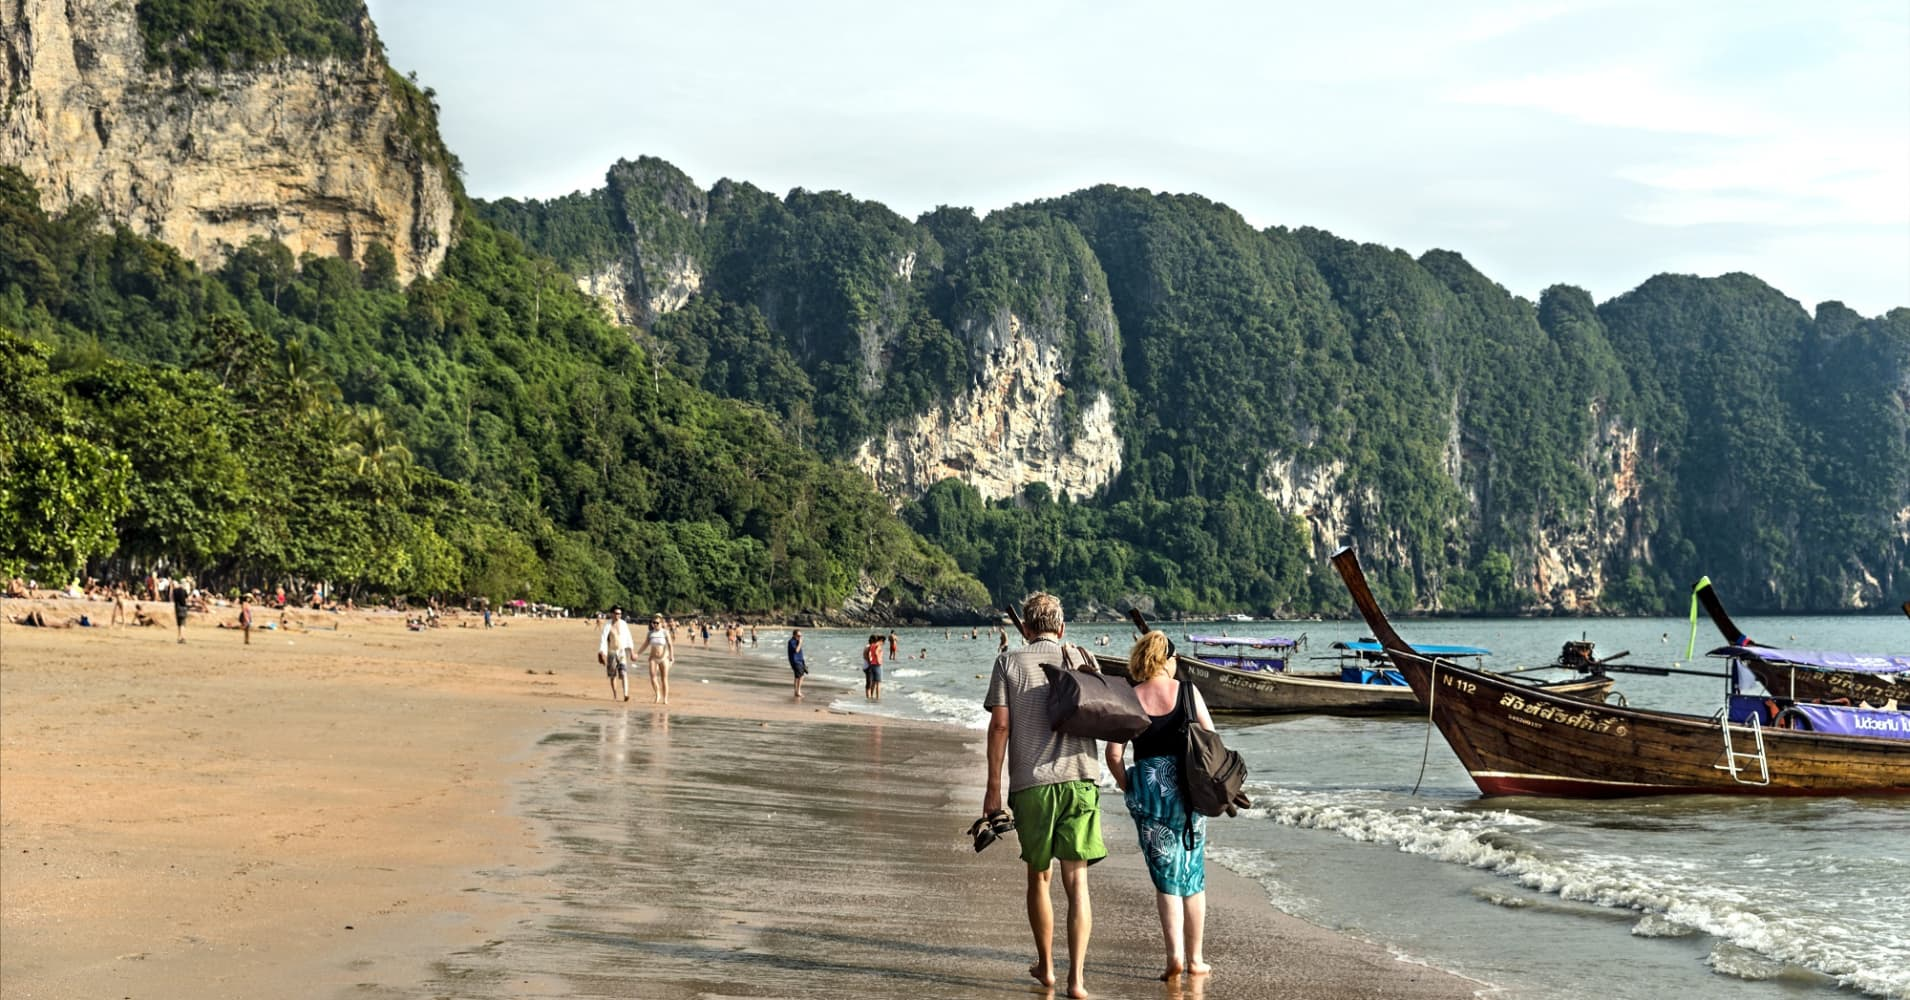 Tourists at Ao Nang Beach, Thailand.